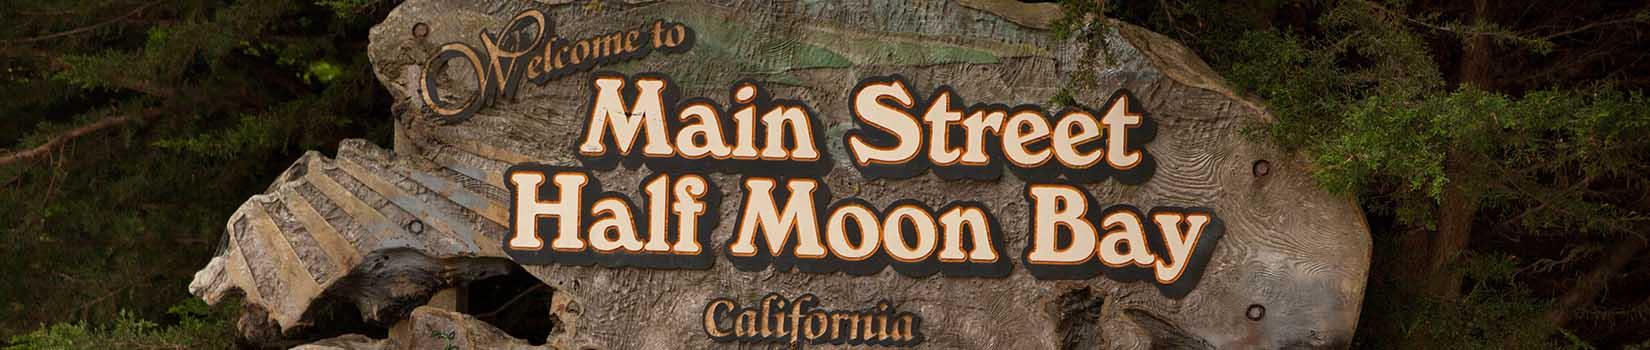 half moon bay downtown sign